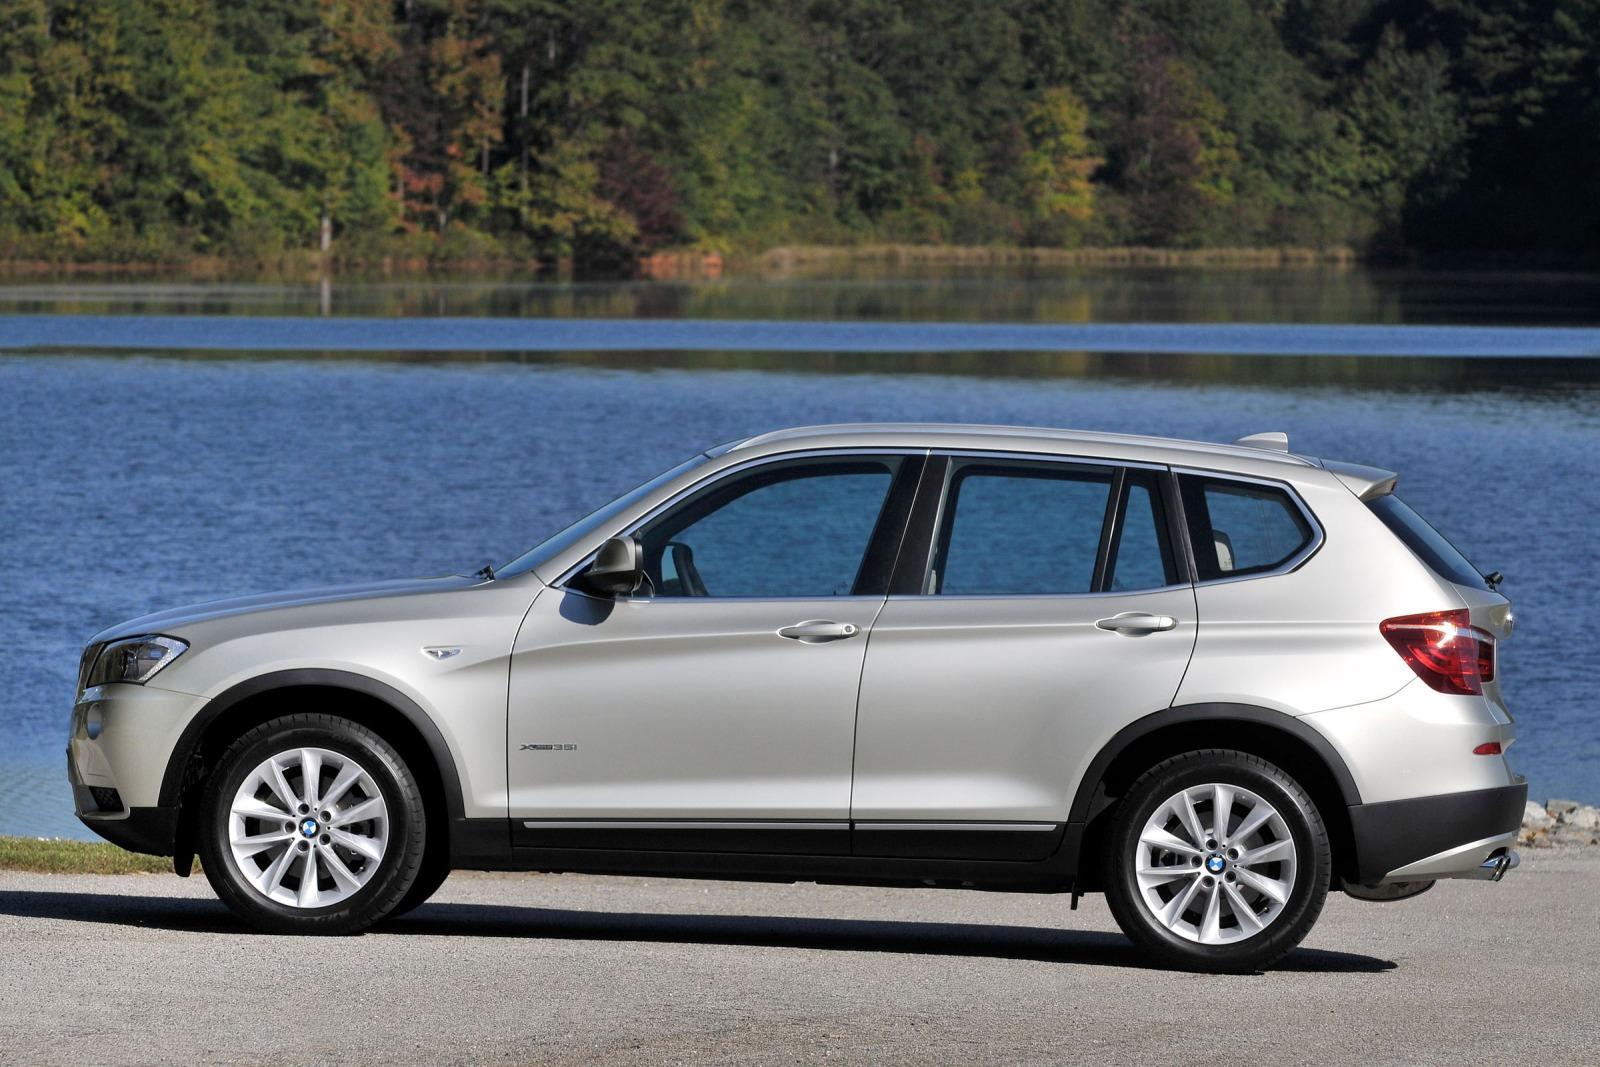 2012 bmw x3 xdrive35i 4dr interior 5 800 1024 1280 1600 origin